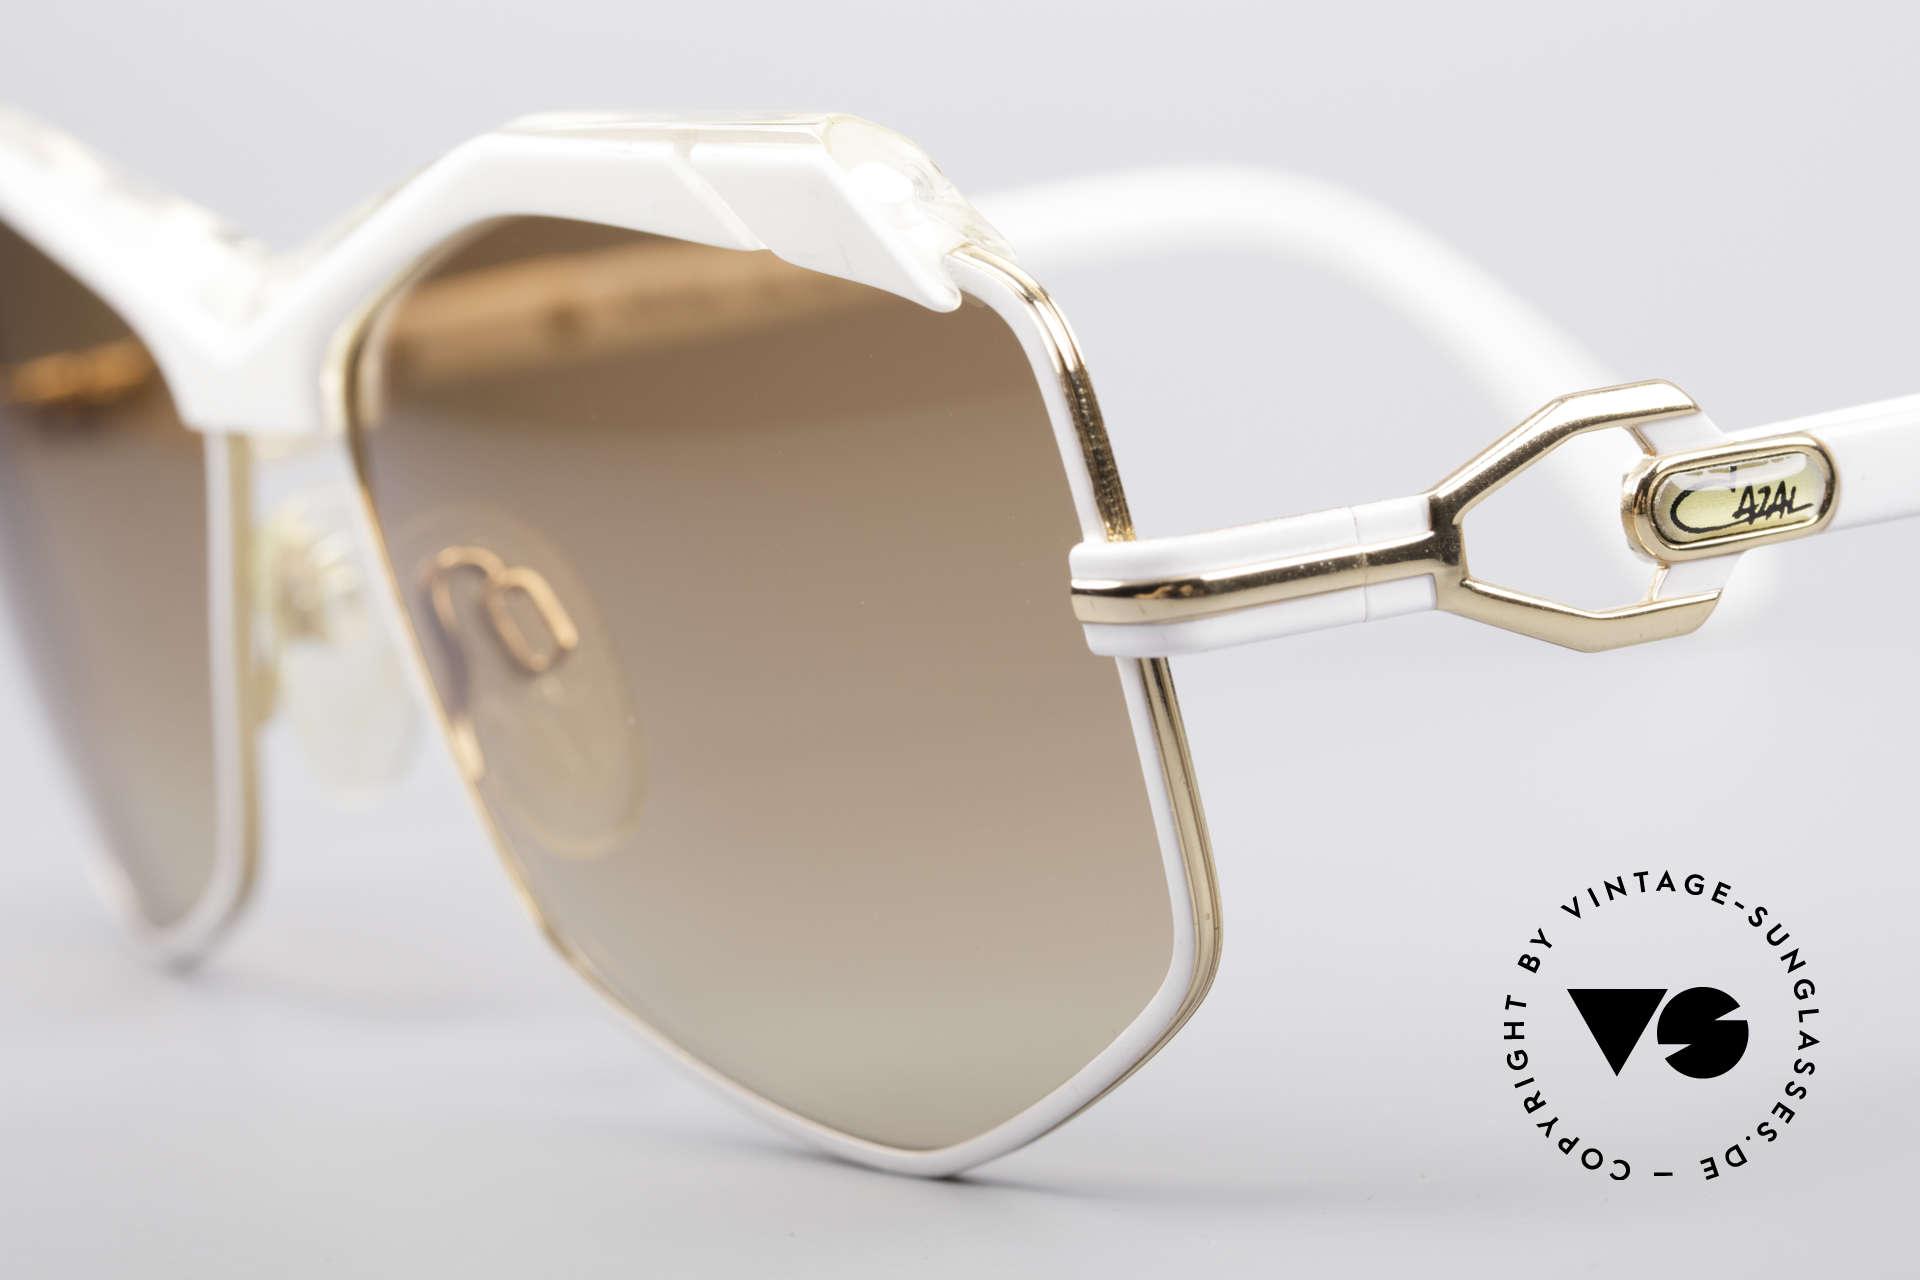 Cazal 230 80er Hip Hop Sonnenbrille, damals Accessoire der amerik. HipHop Szene, Passend für Damen